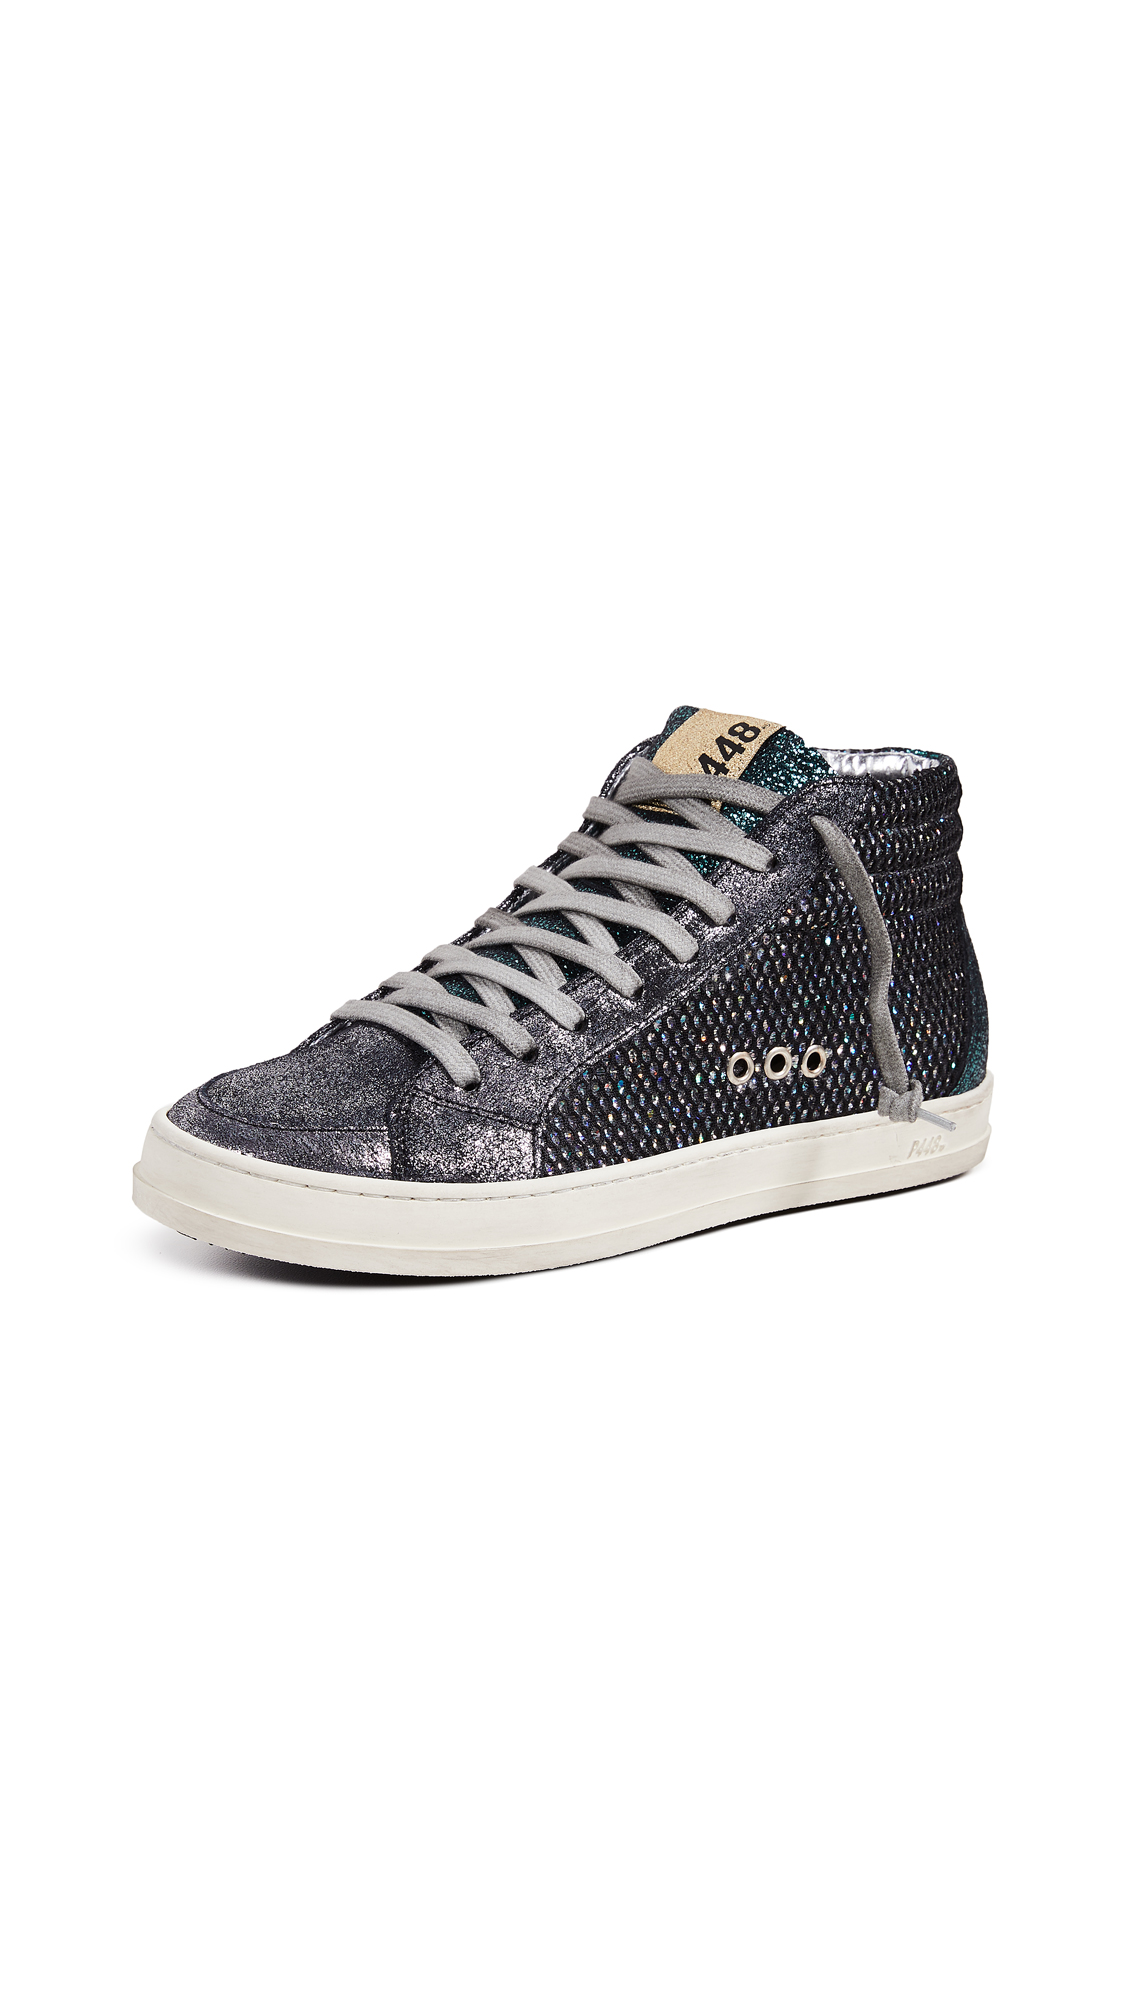 P448 Skate Sneakers - Gltec Ant